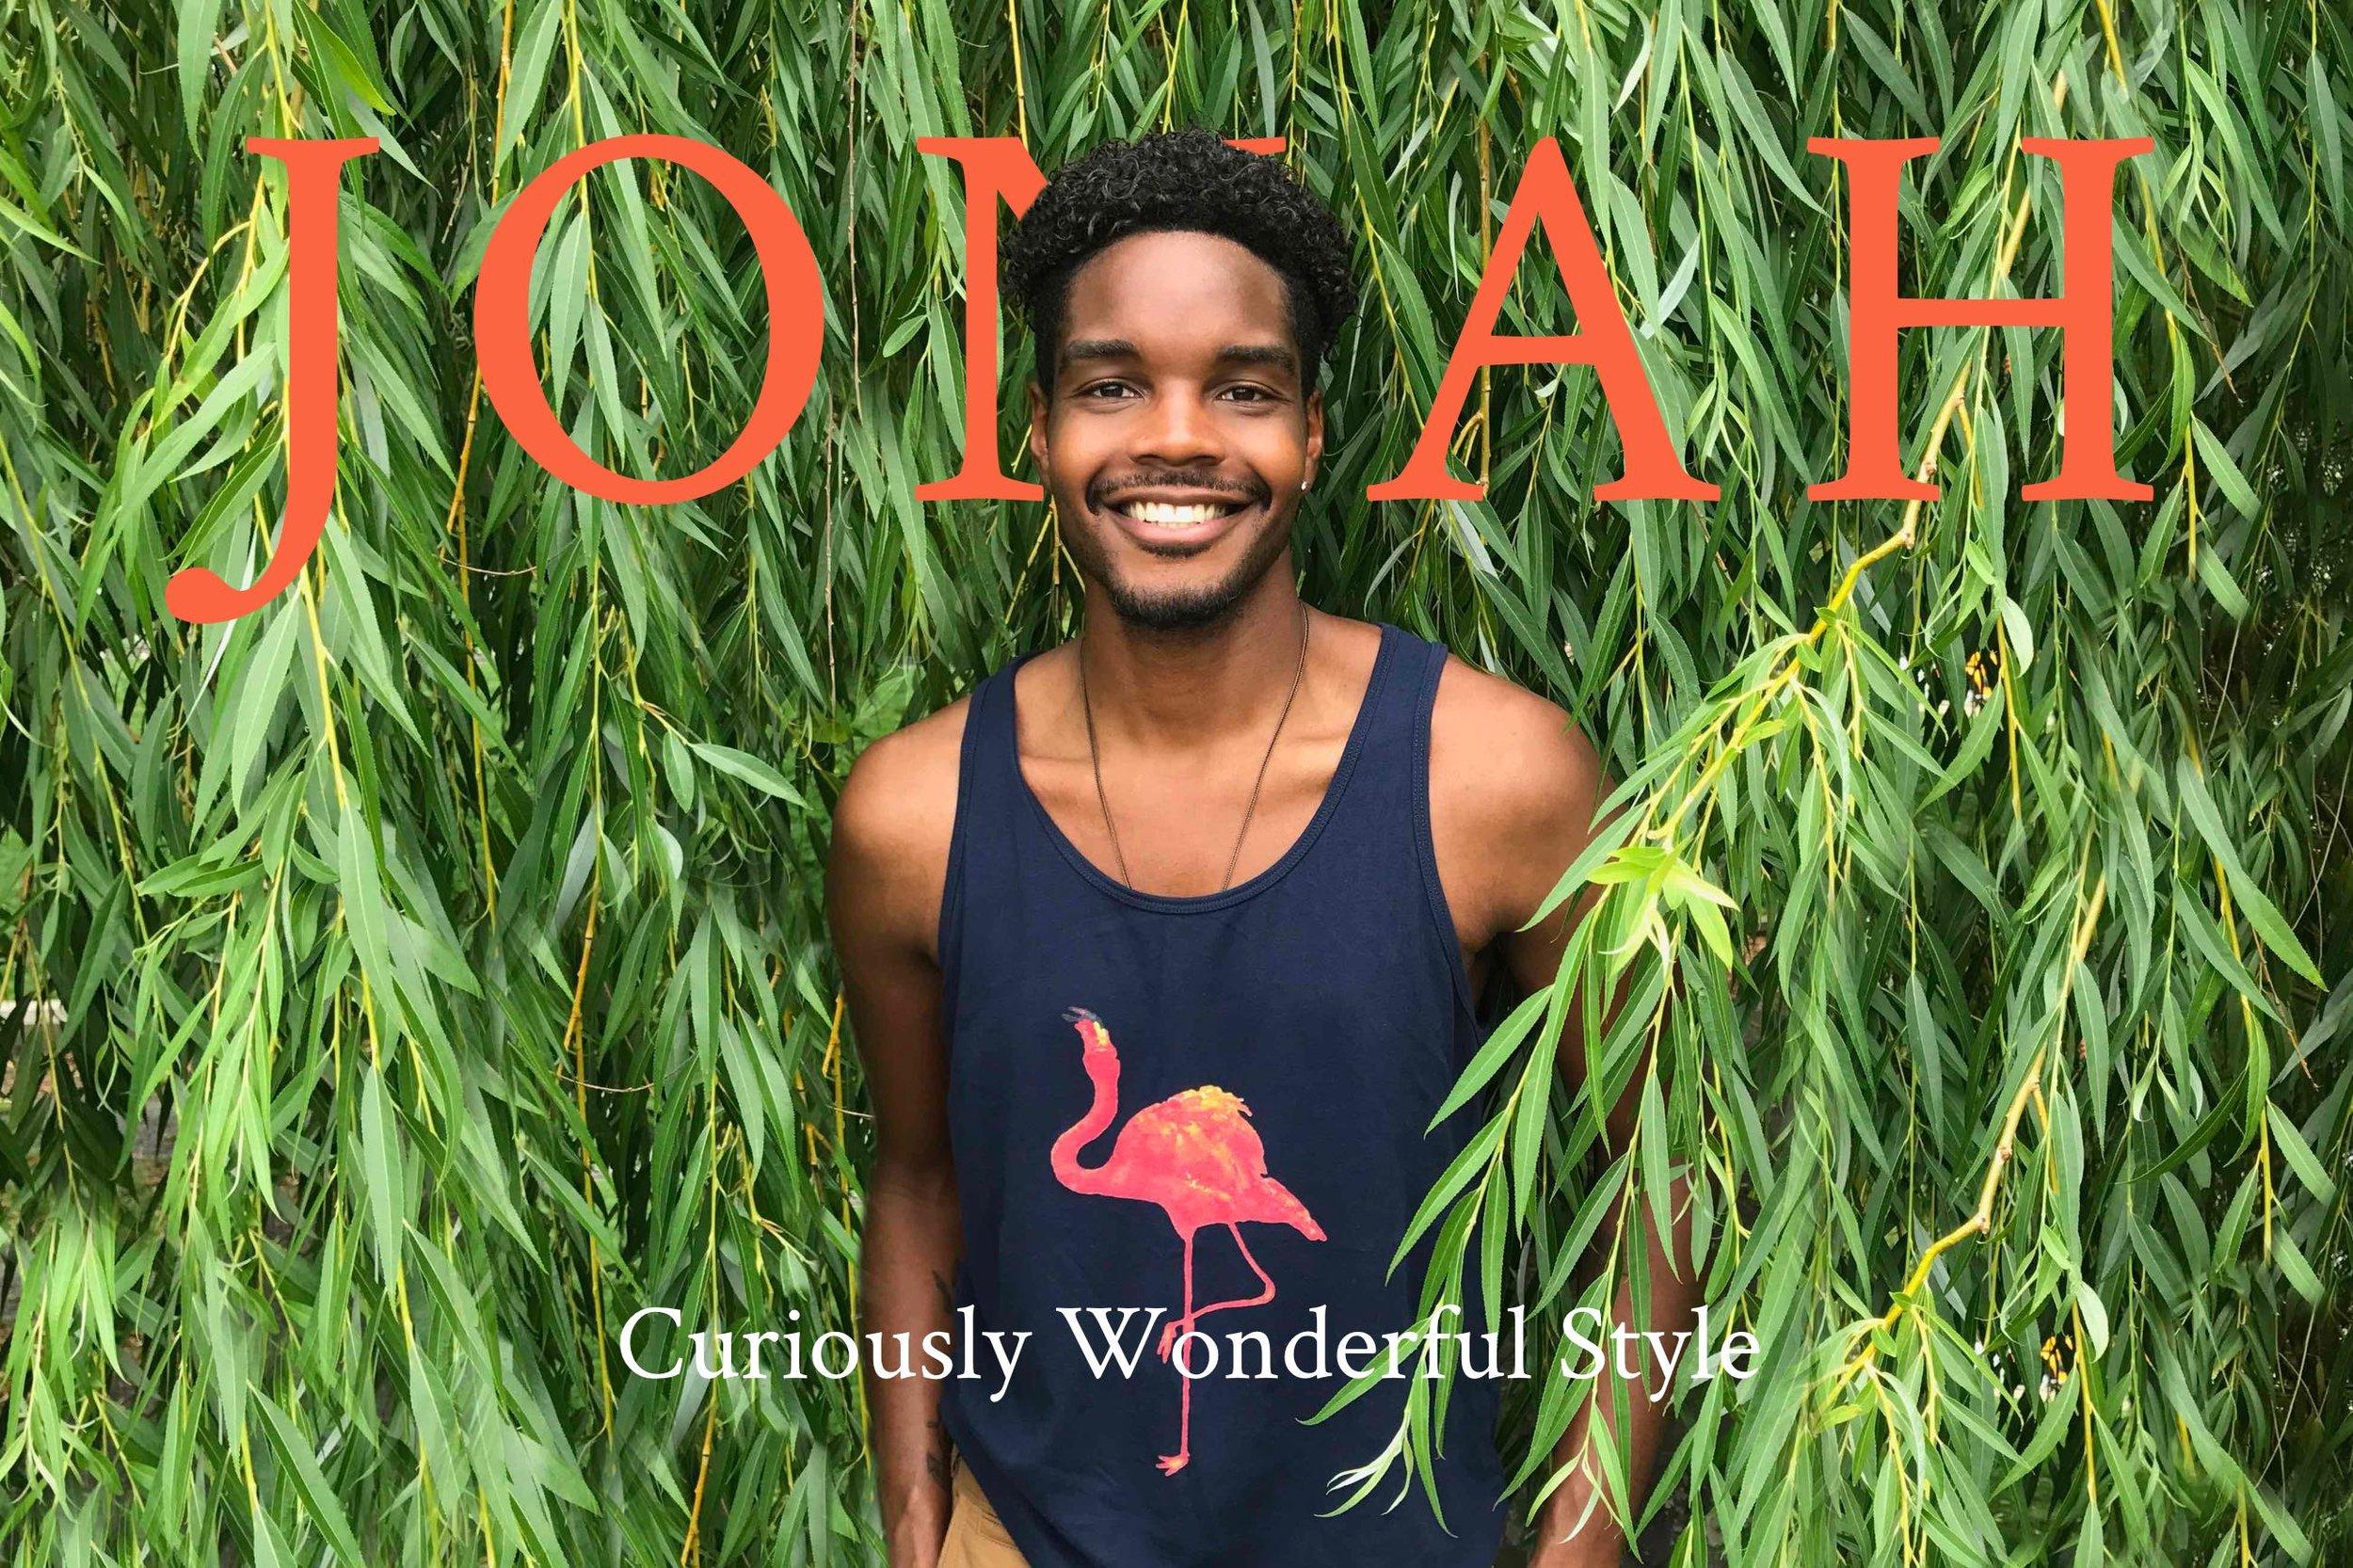 Jonah+Web+Opener+flamingo+tank.jpg